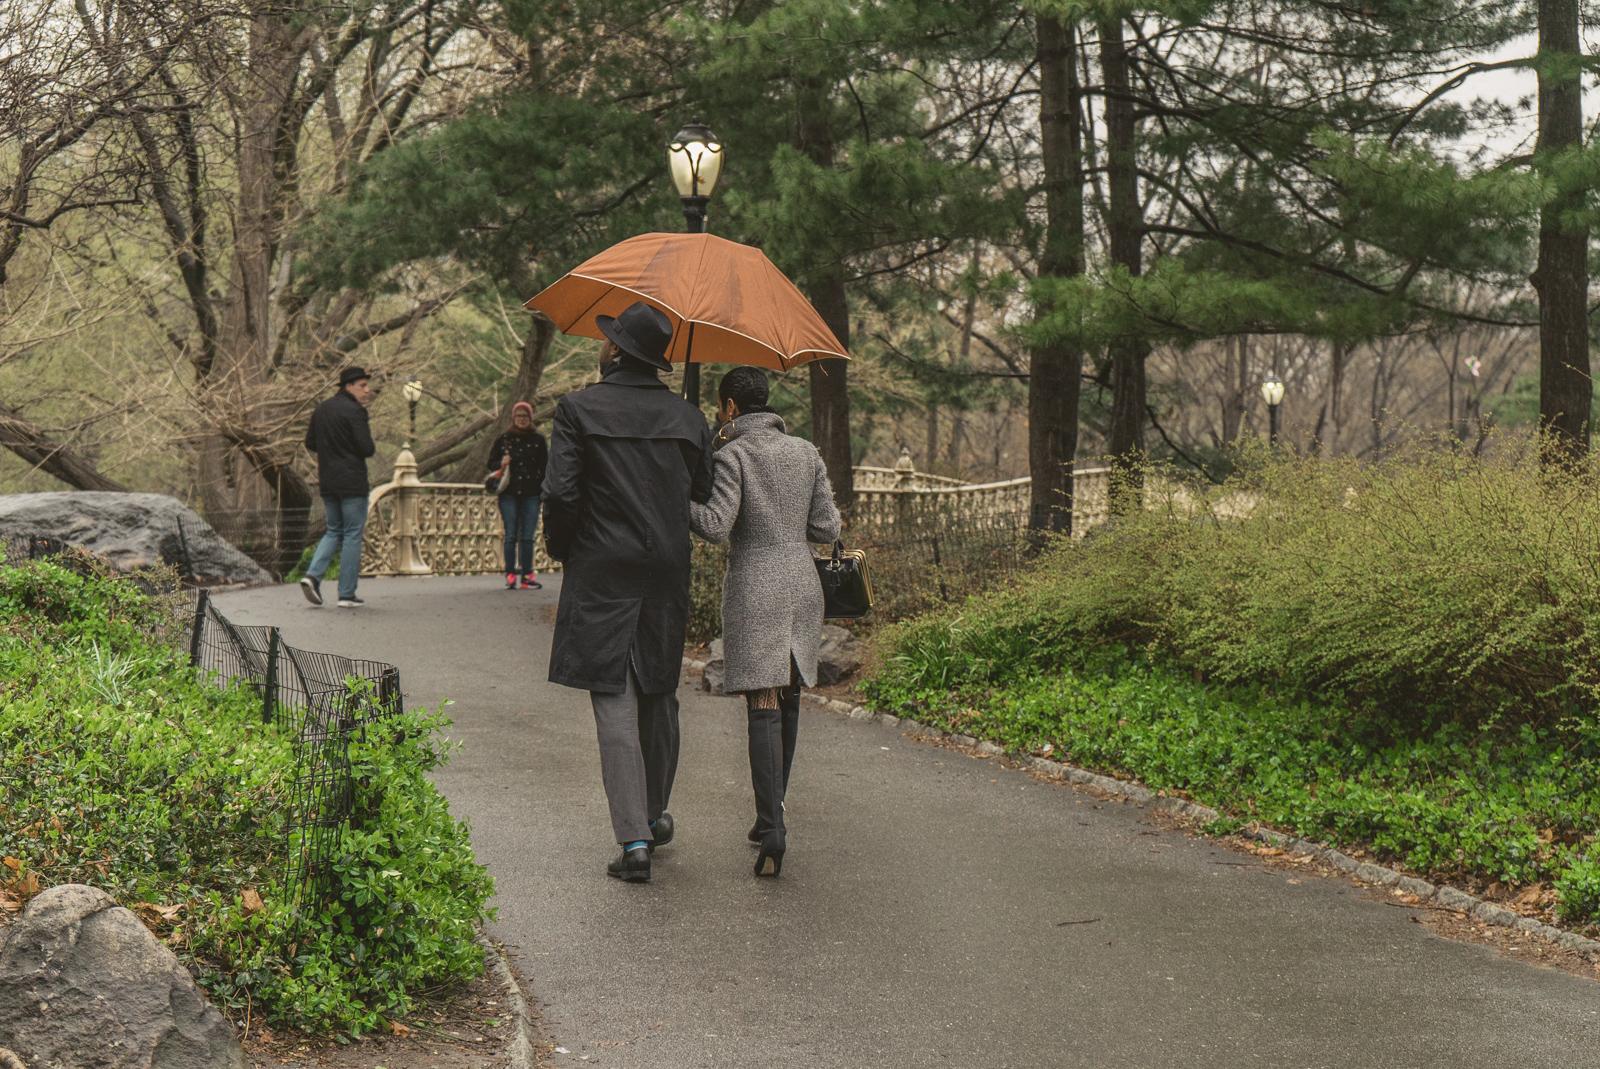 Photo 5 Pine Bank bridge Central Park Marriage Proposal | VladLeto